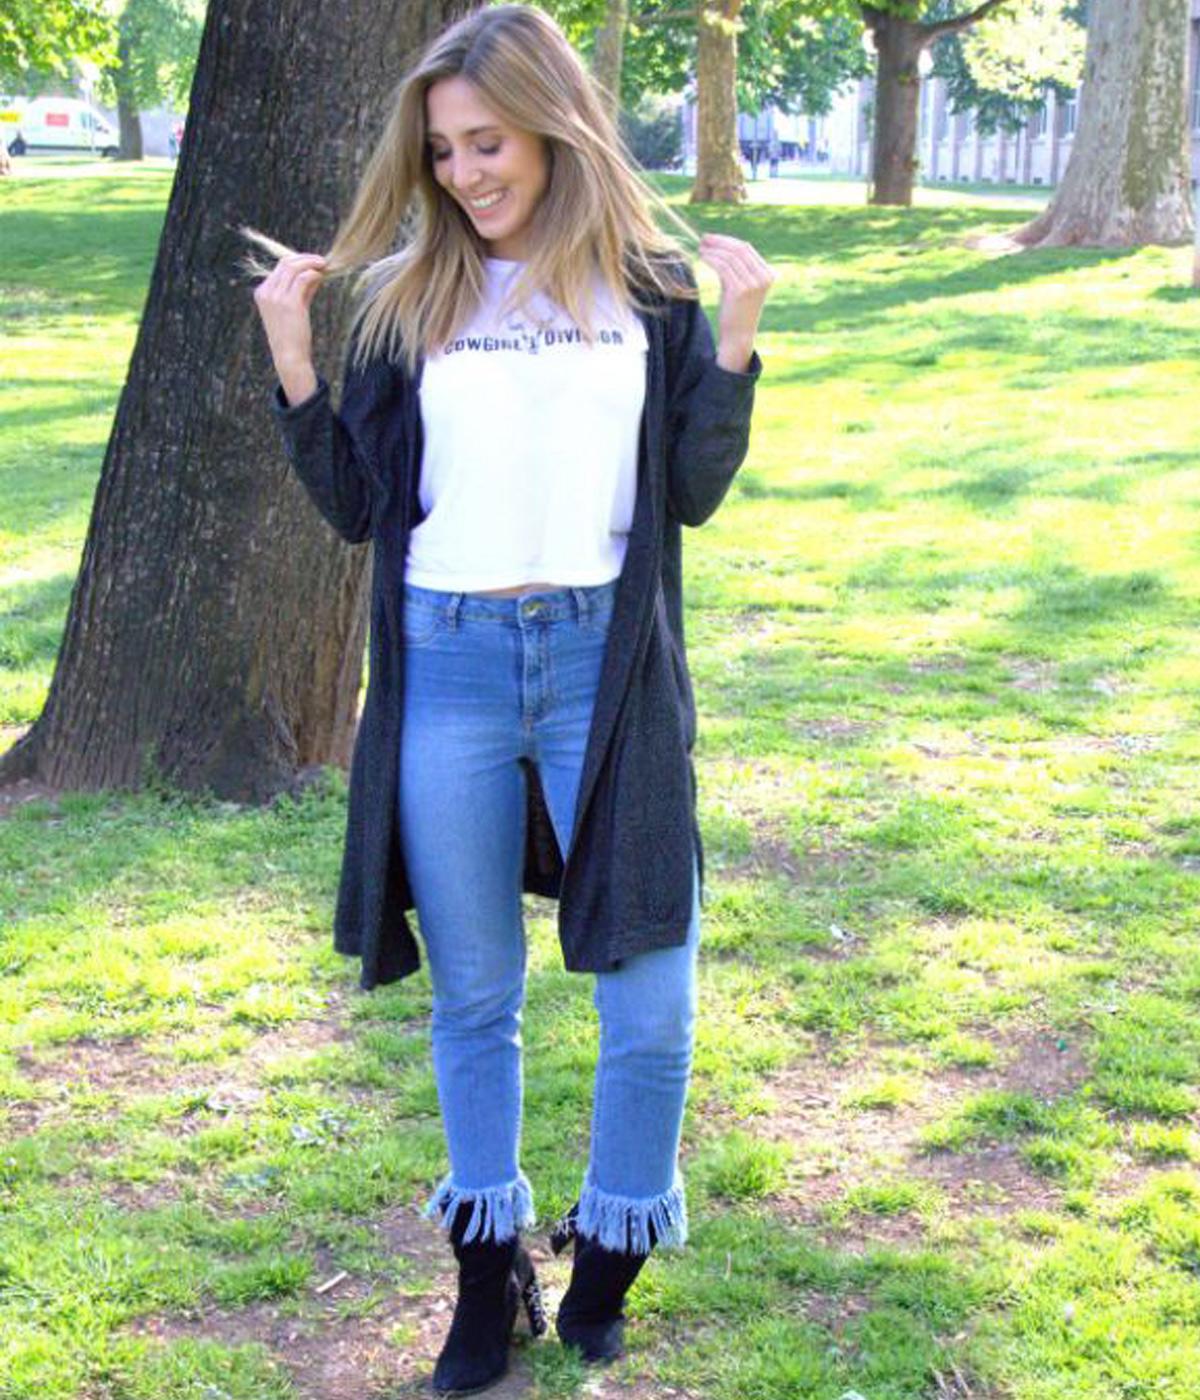 vanessa-cowgirl-fransen-jeans-boots-stiefel-8